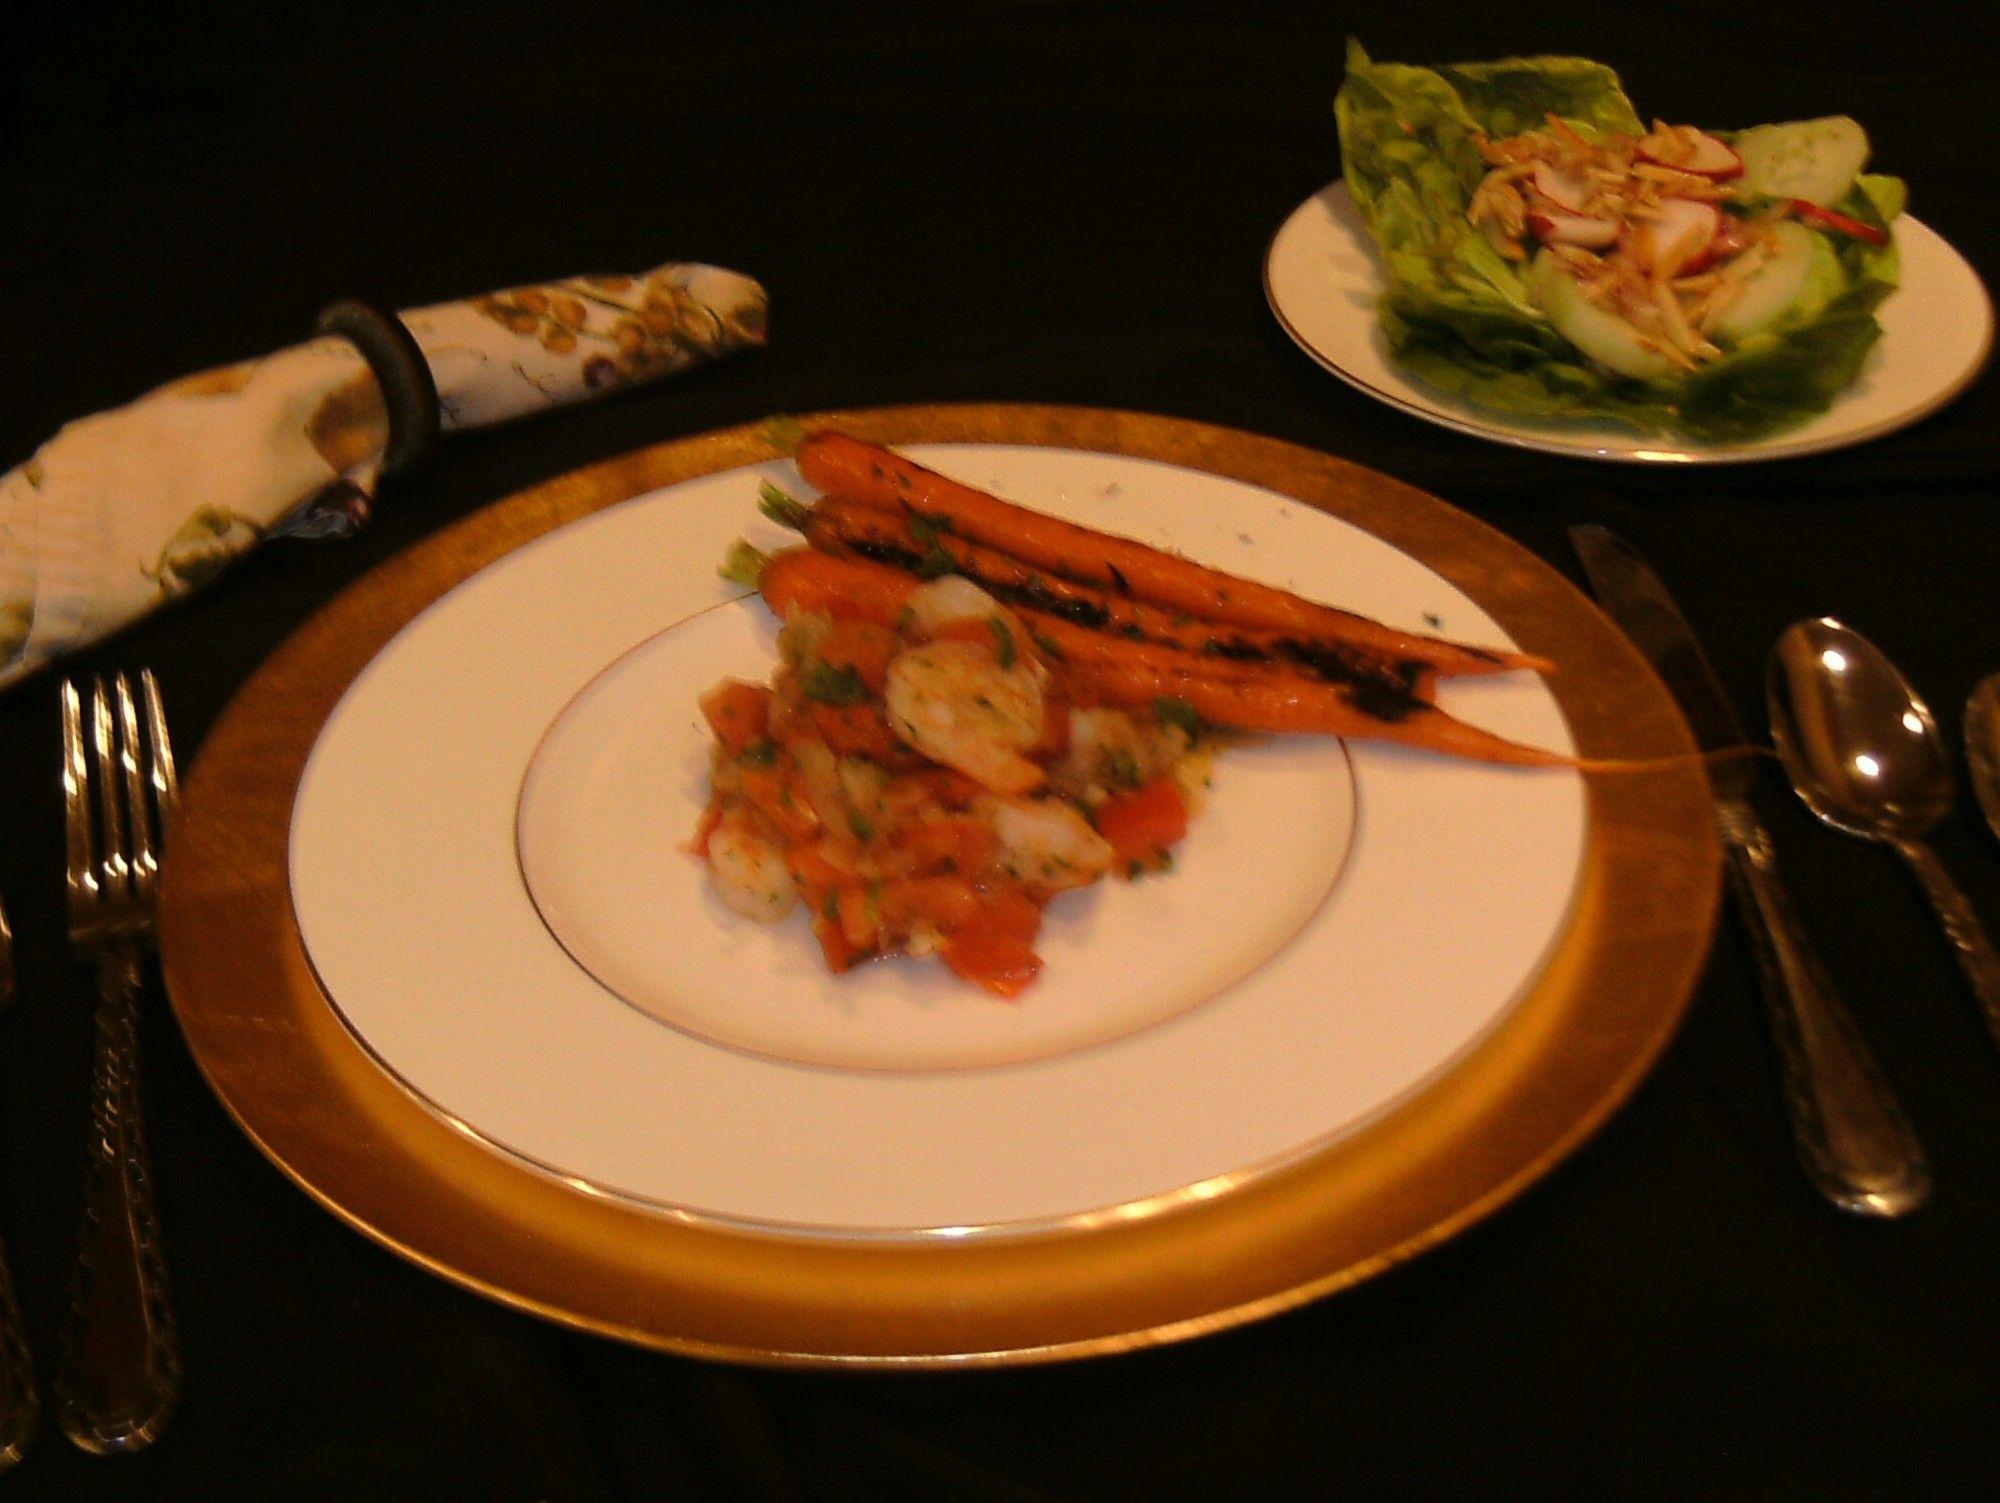 Shrimp And Cucumber Salad With Horseradish Mayo Recipe — Dishmaps